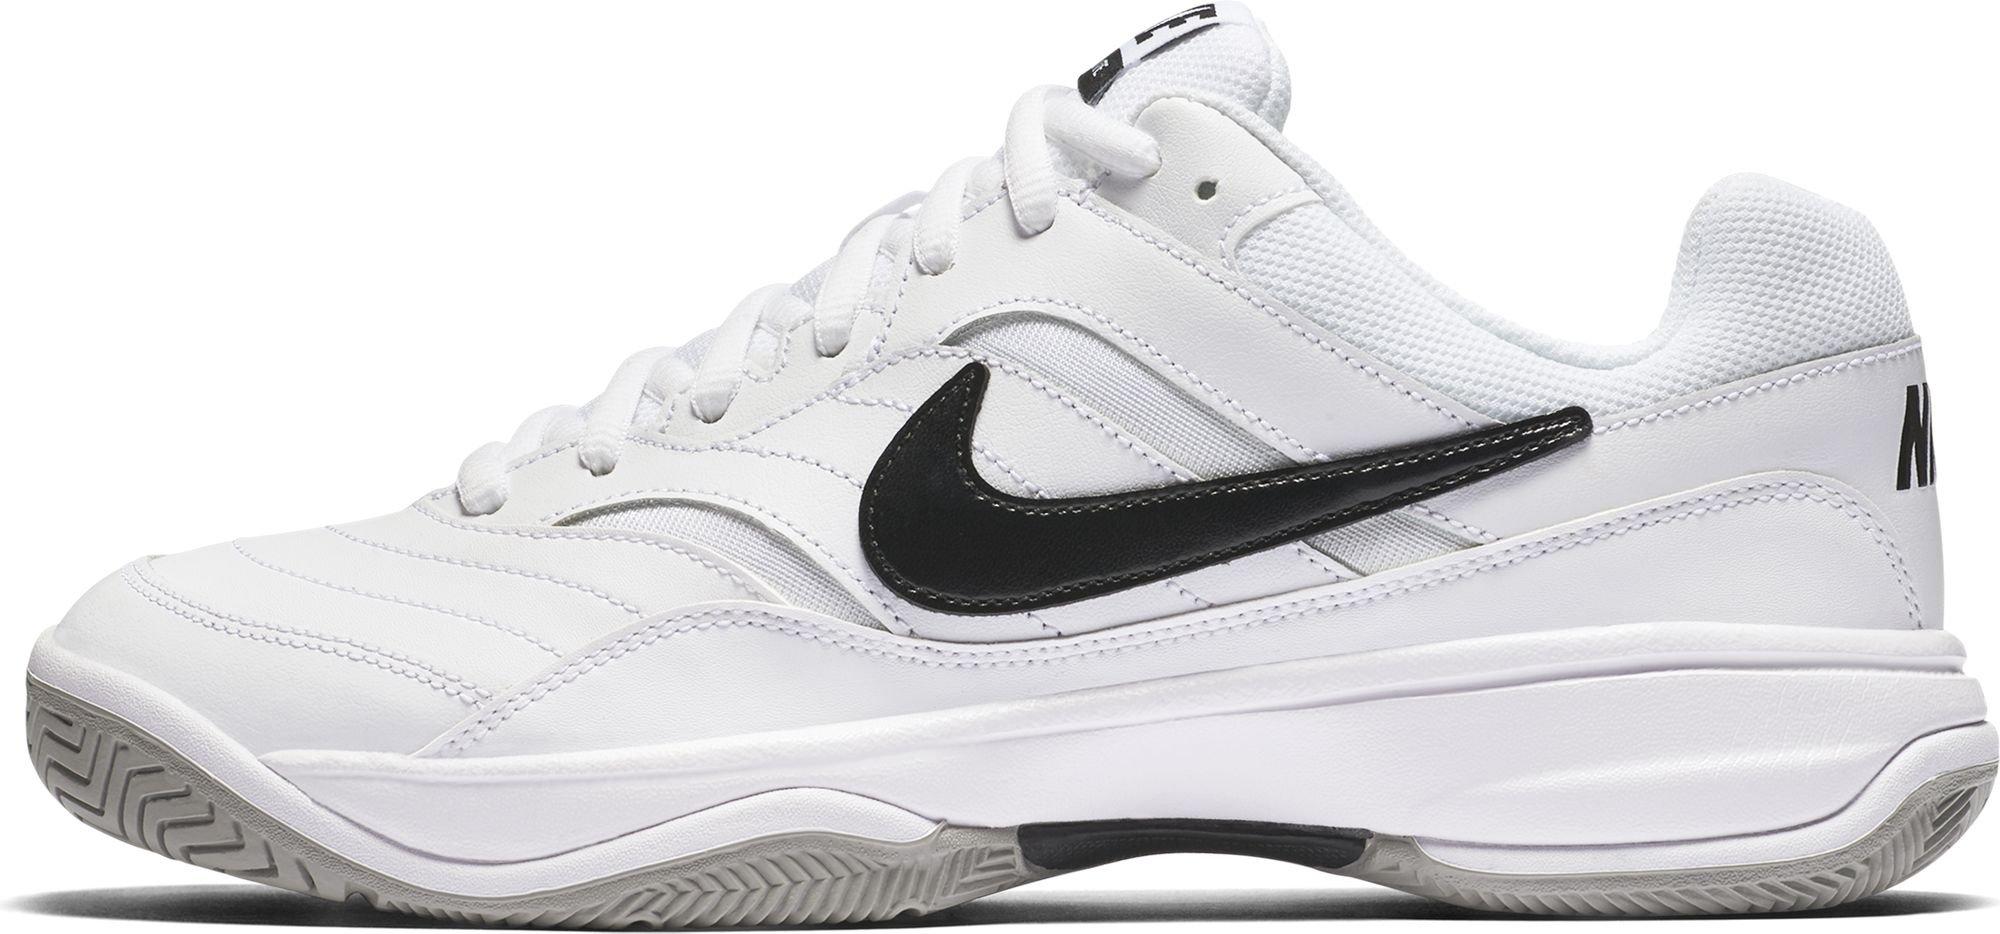 NIKE Men's Court Lite Tennis Shoe, White/Medium Grey/Black, 13 D(M) US by NIKE